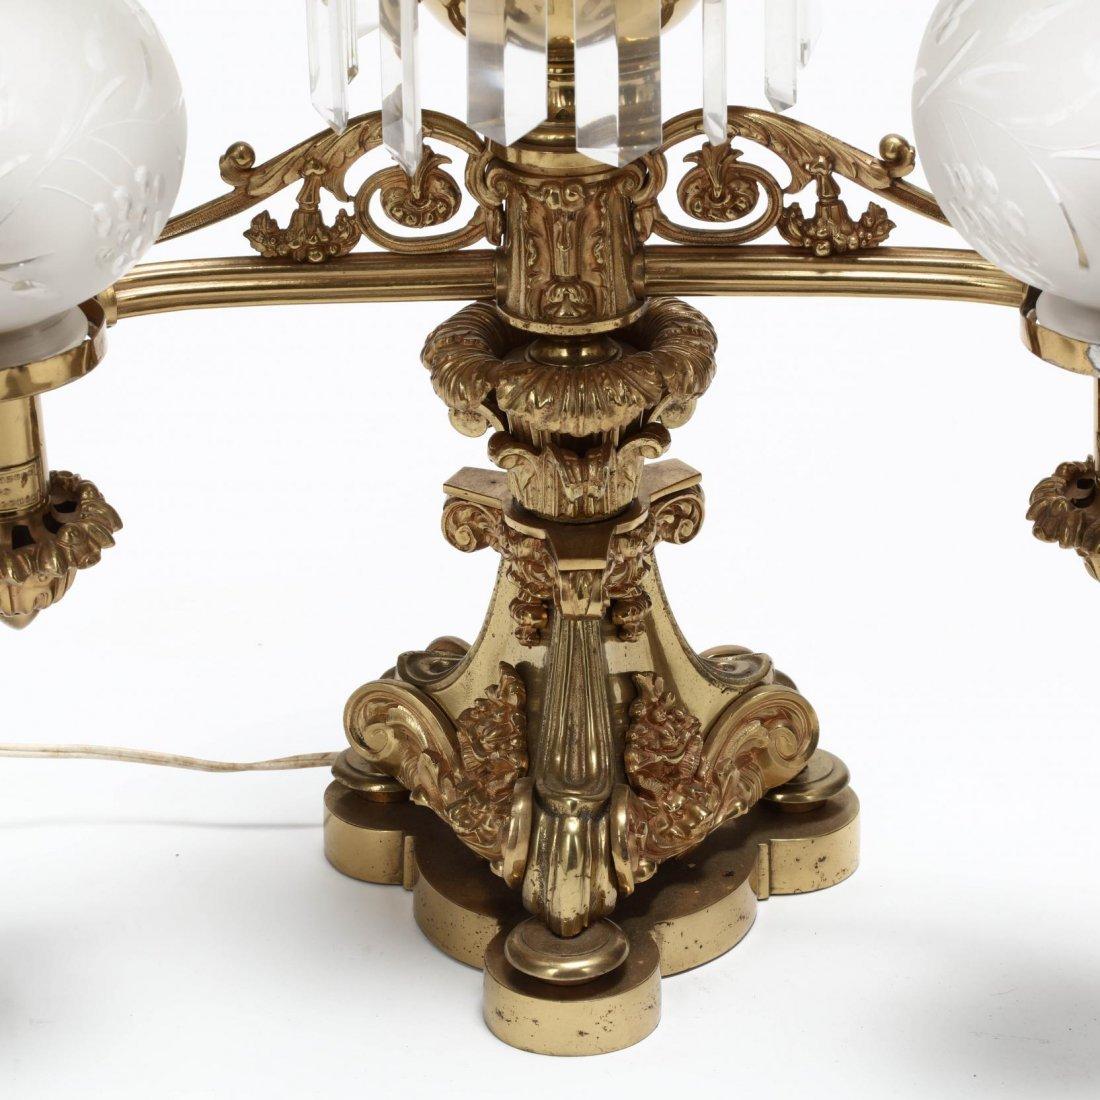 Lewis Veron & Co., Pair of Argand Lamps - 2